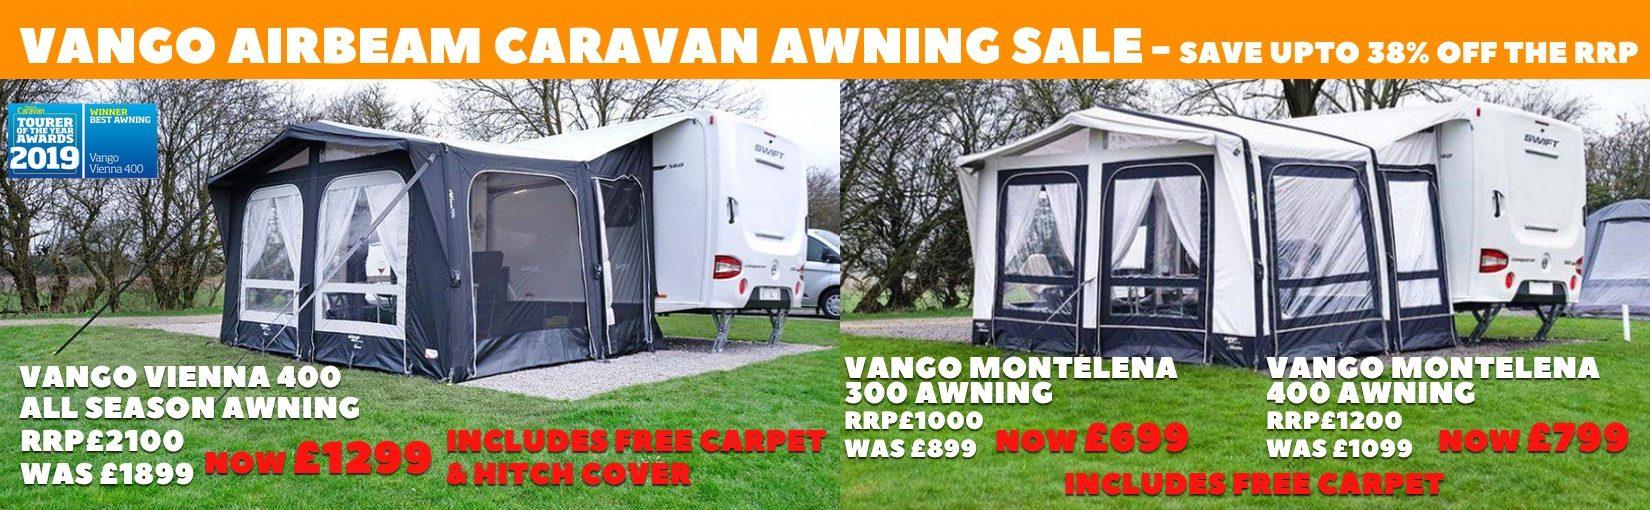 Vango Awning Sale October 20 1